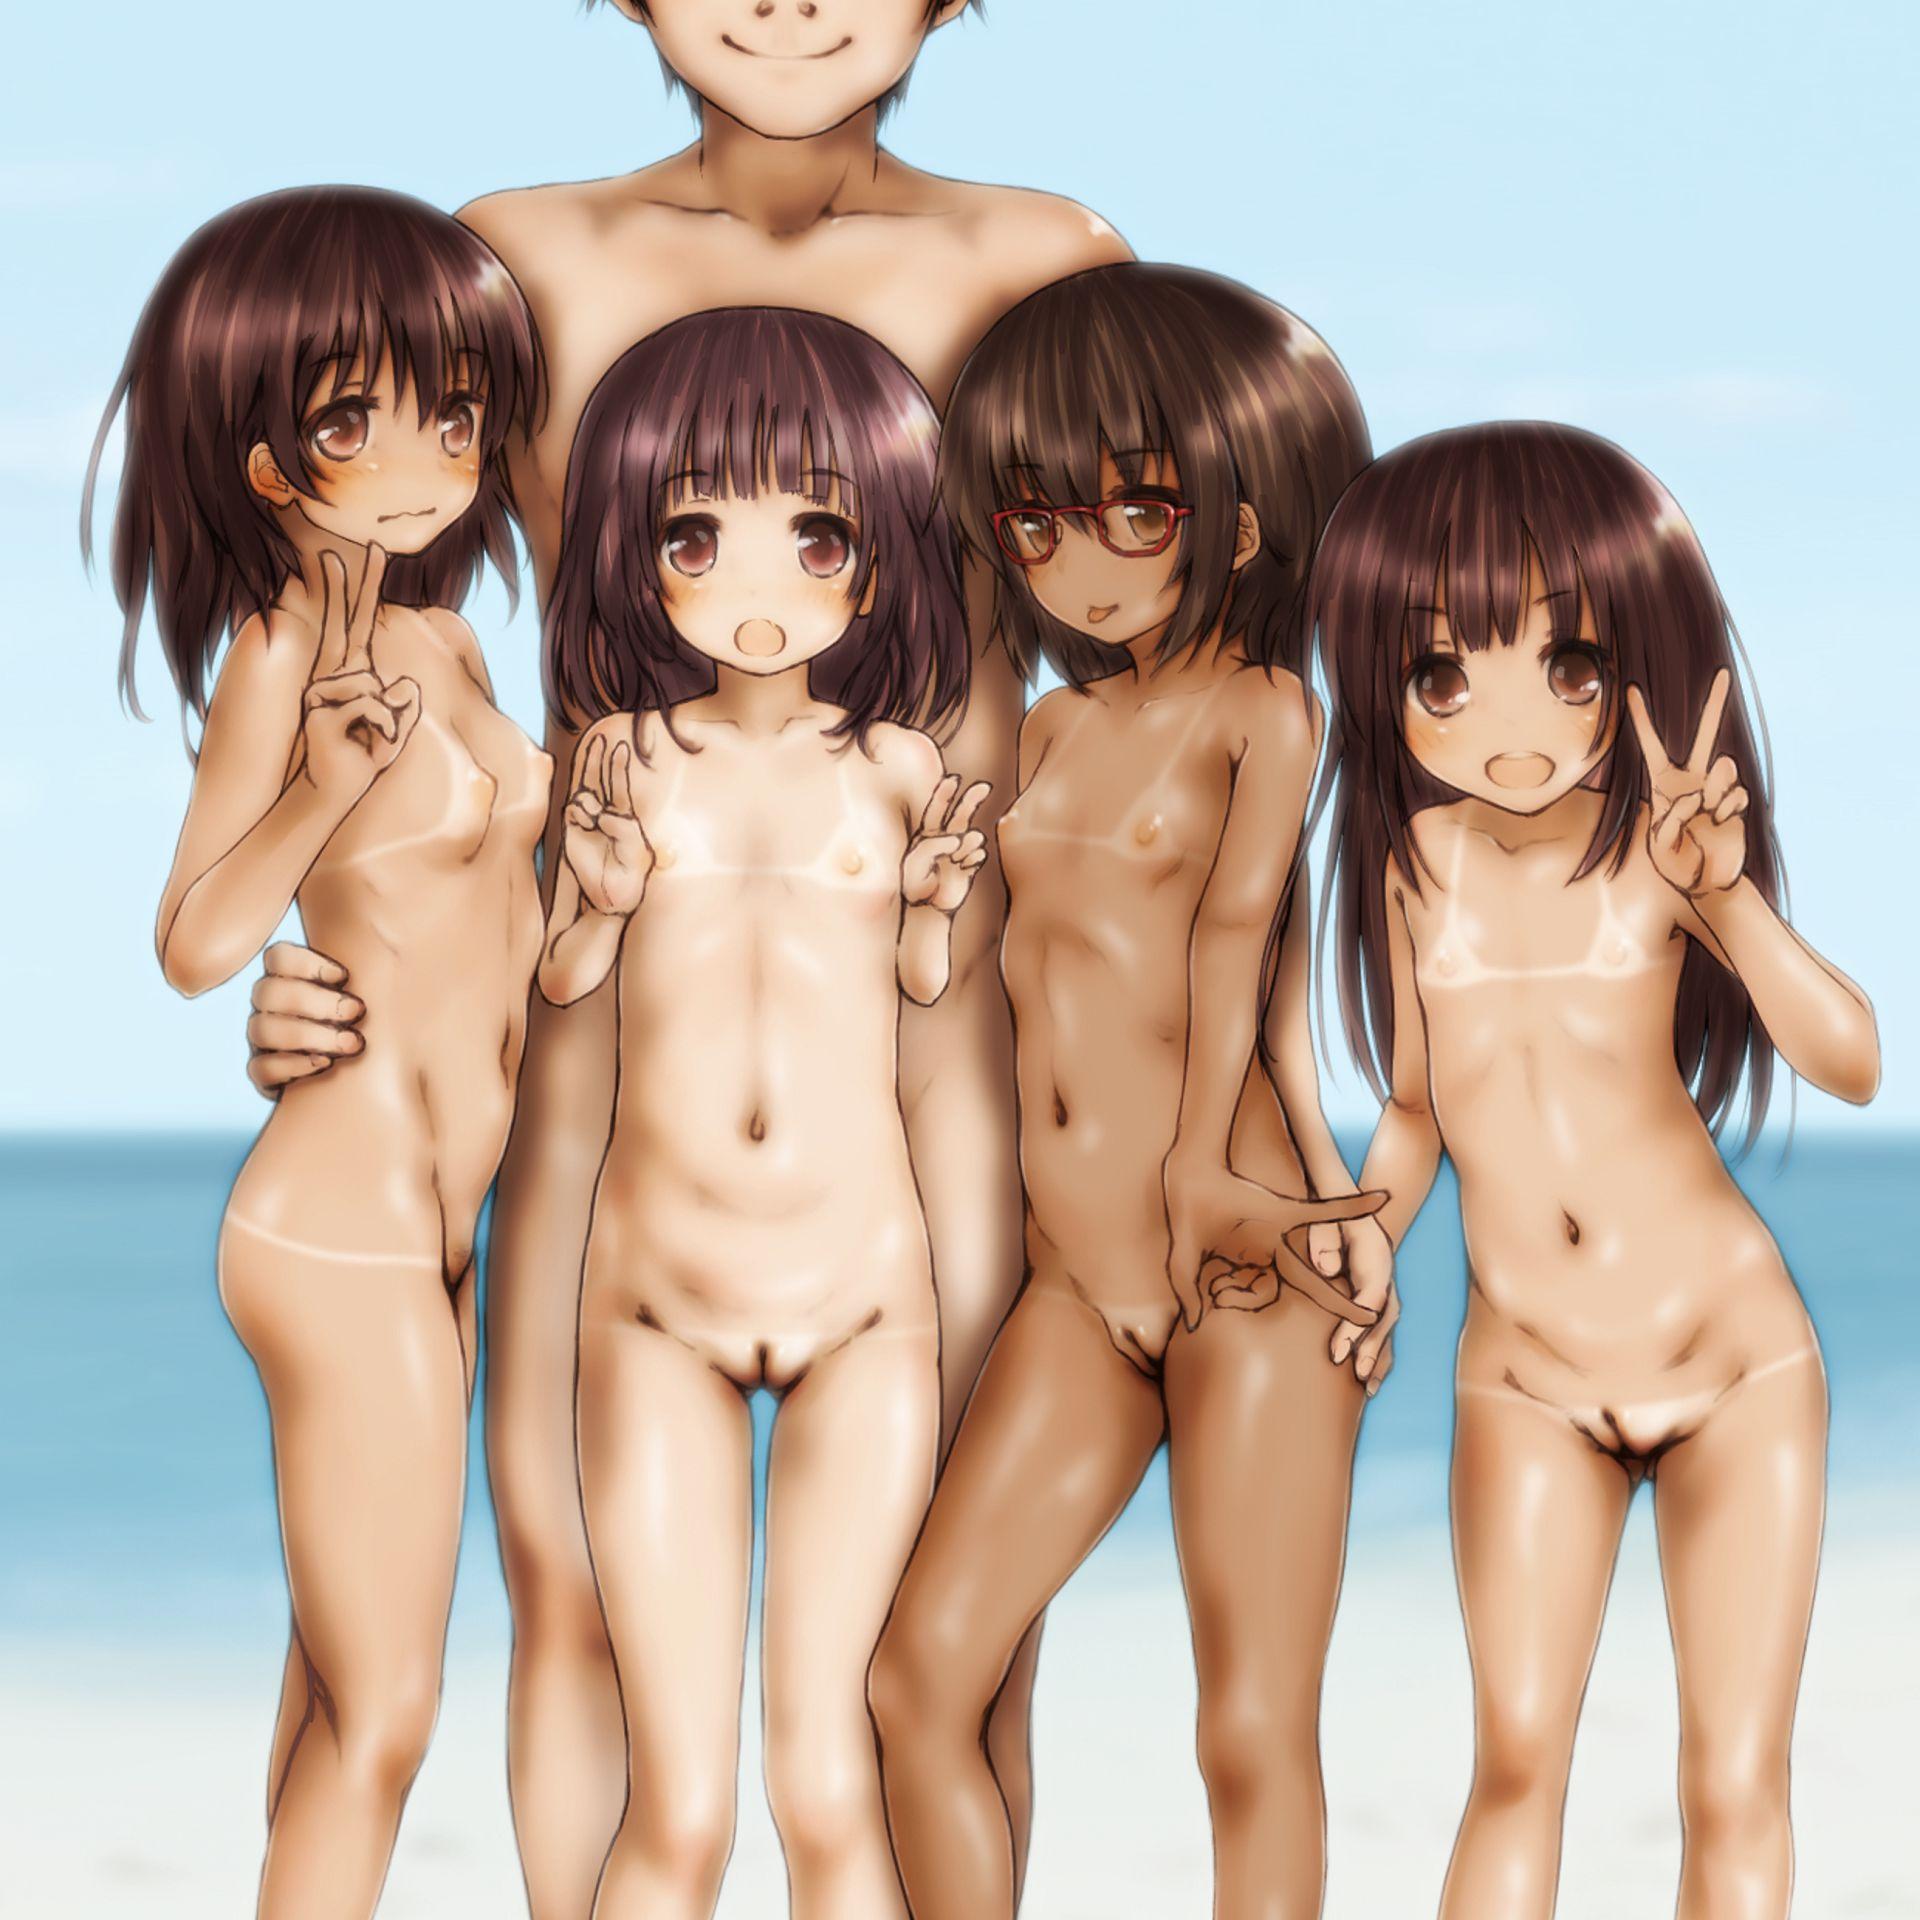 loli completely_nude049